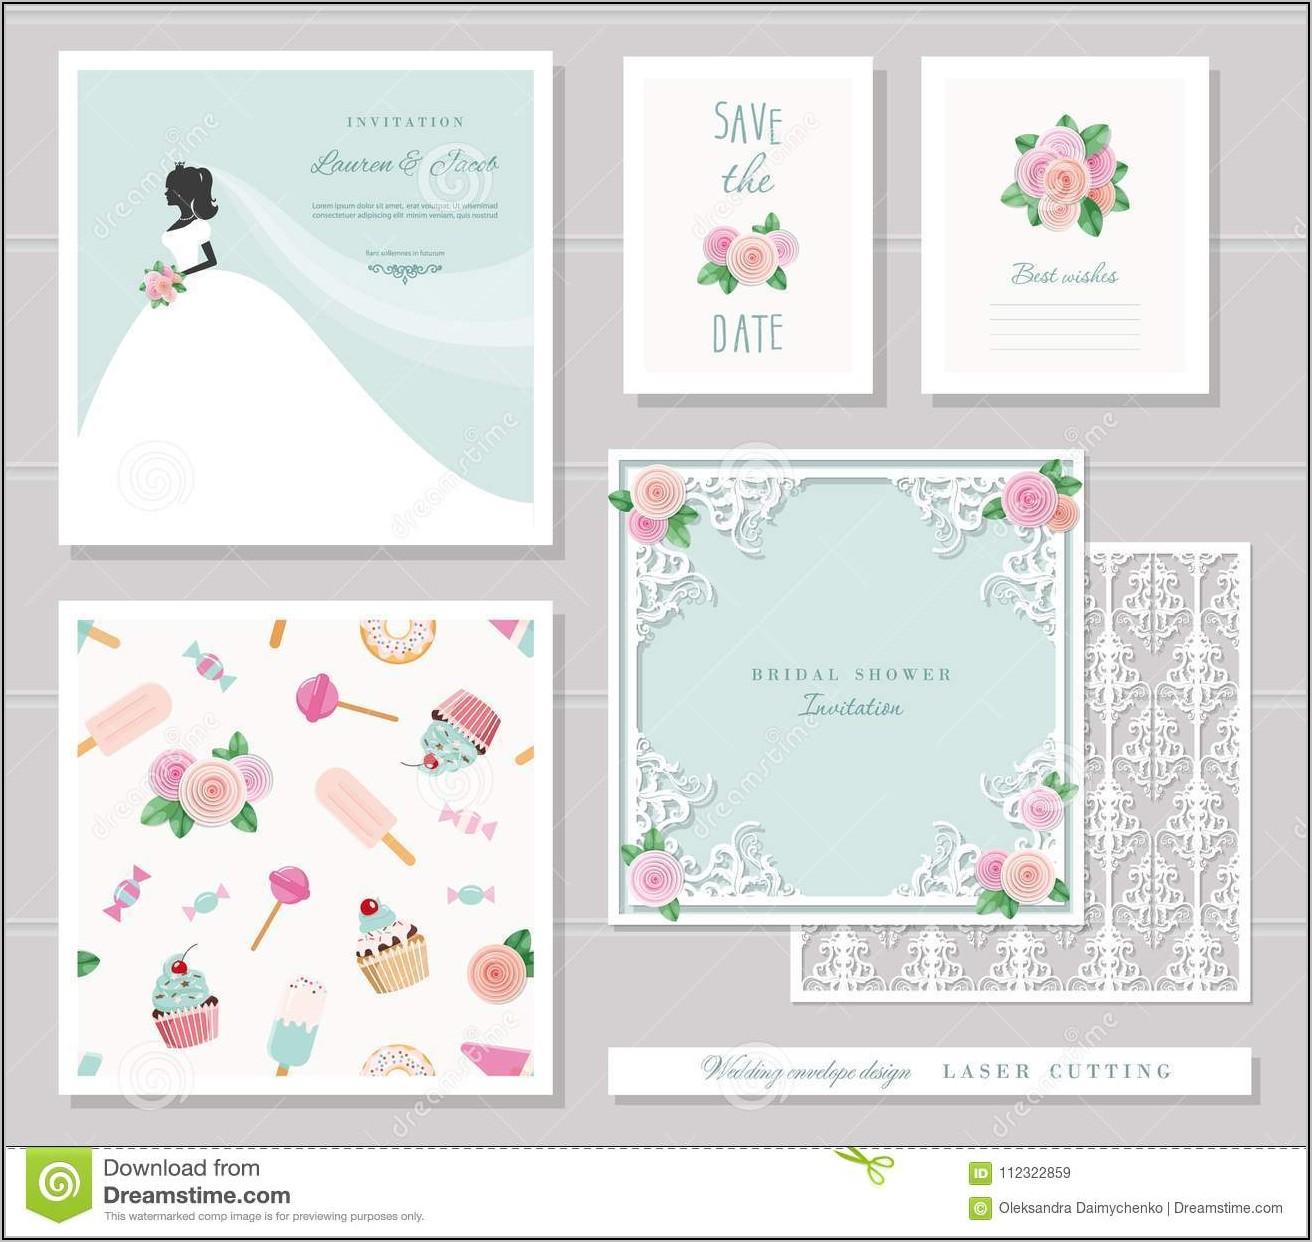 Wedding Invitation Envelope Design Templates